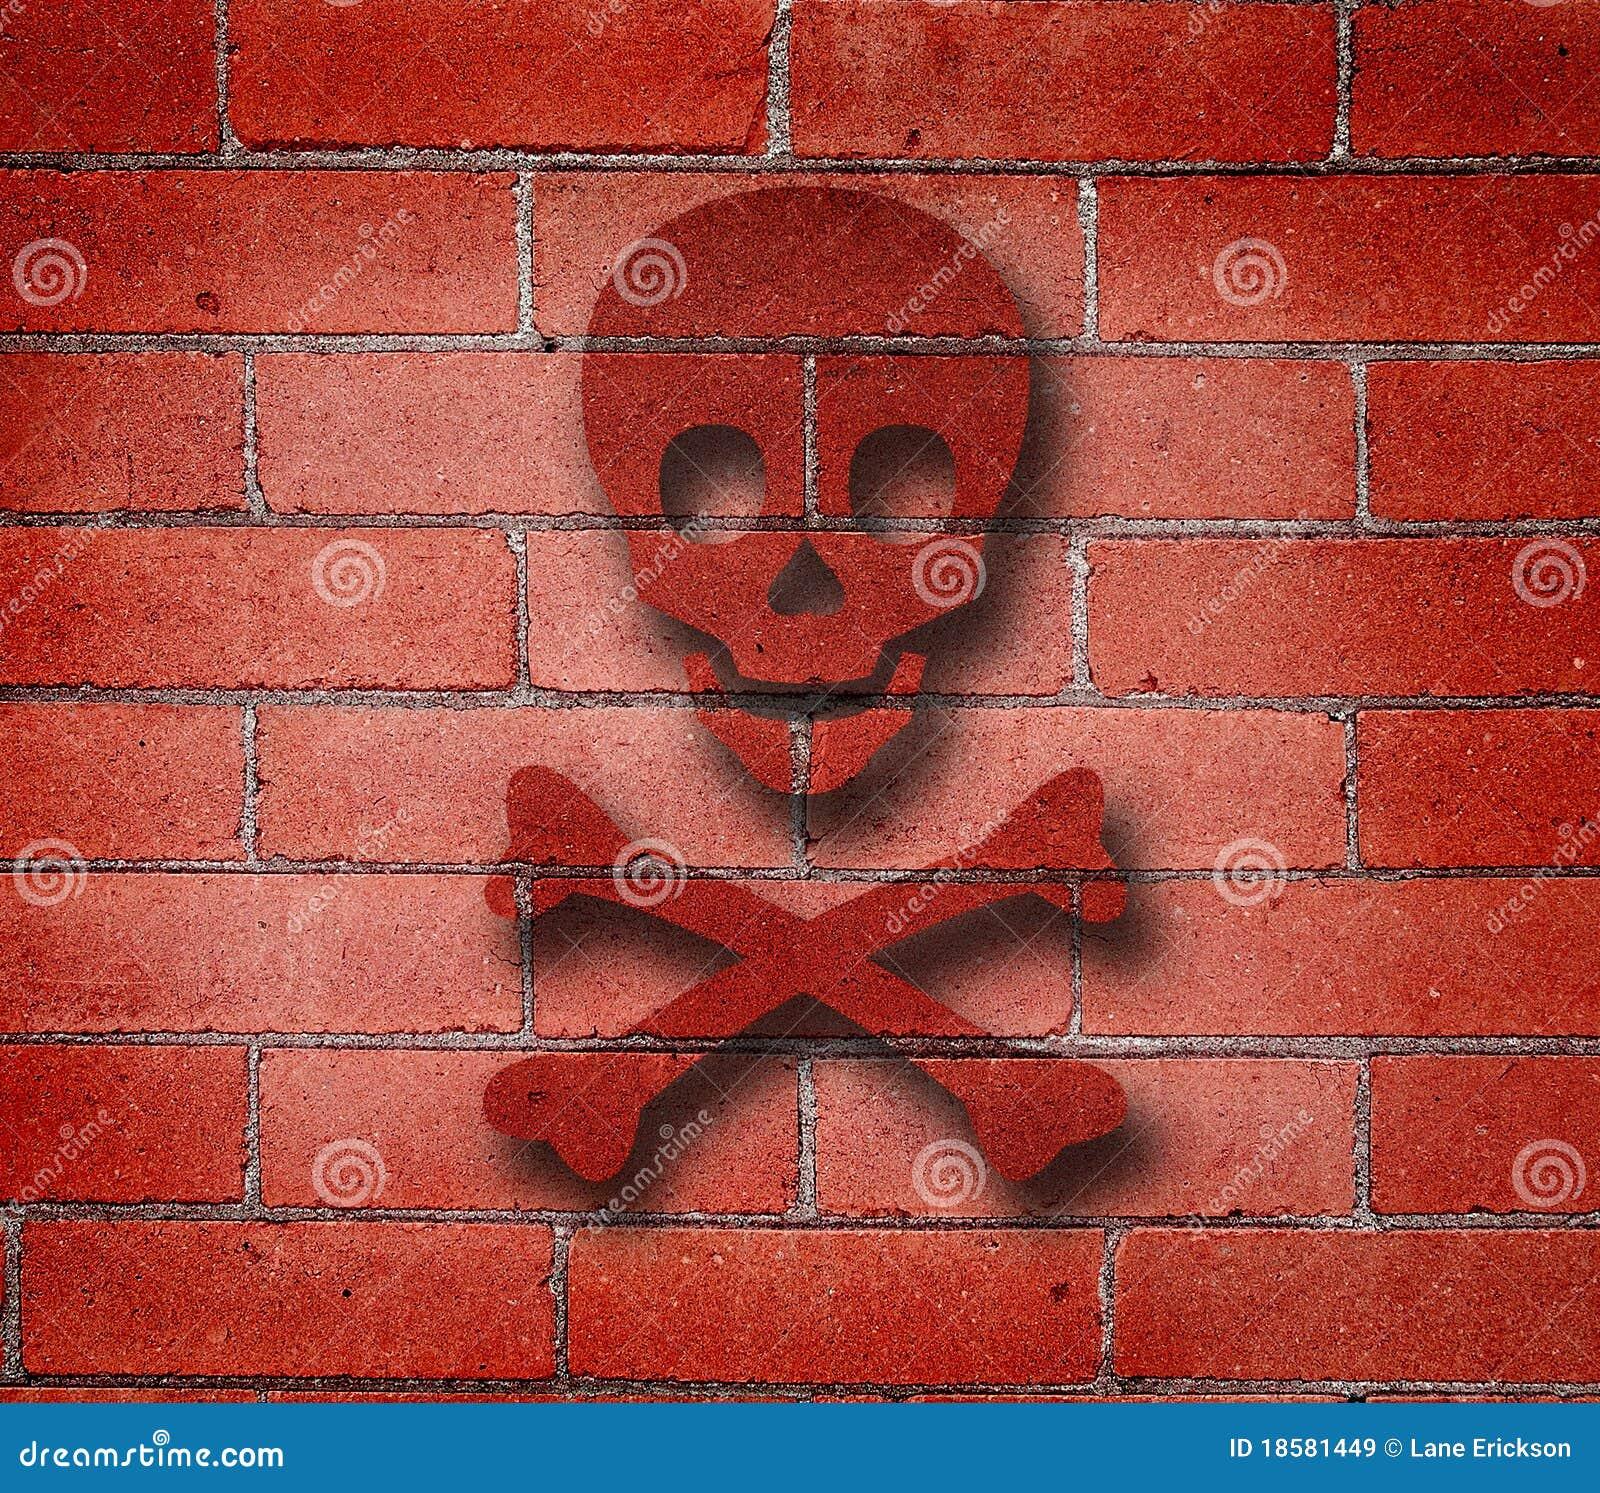 Grafiti wall red - Red Brick Wall With Cross Bones Graffiti Royalty Free Stock Images